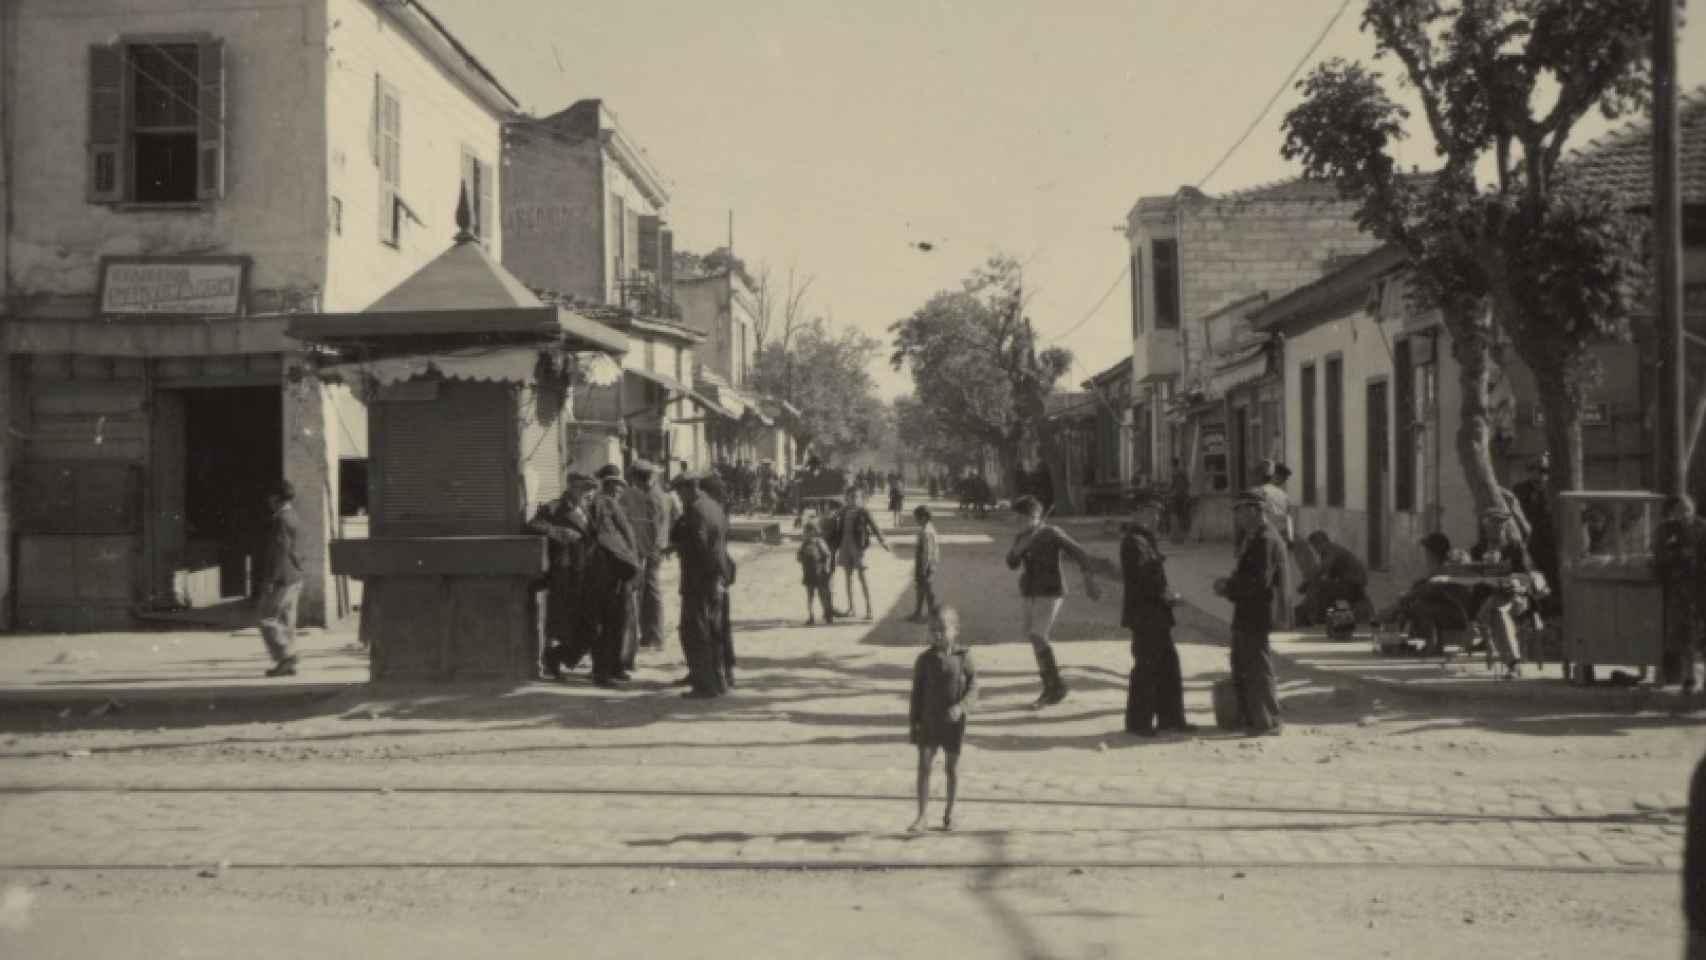 El gueto judío de Salónica.